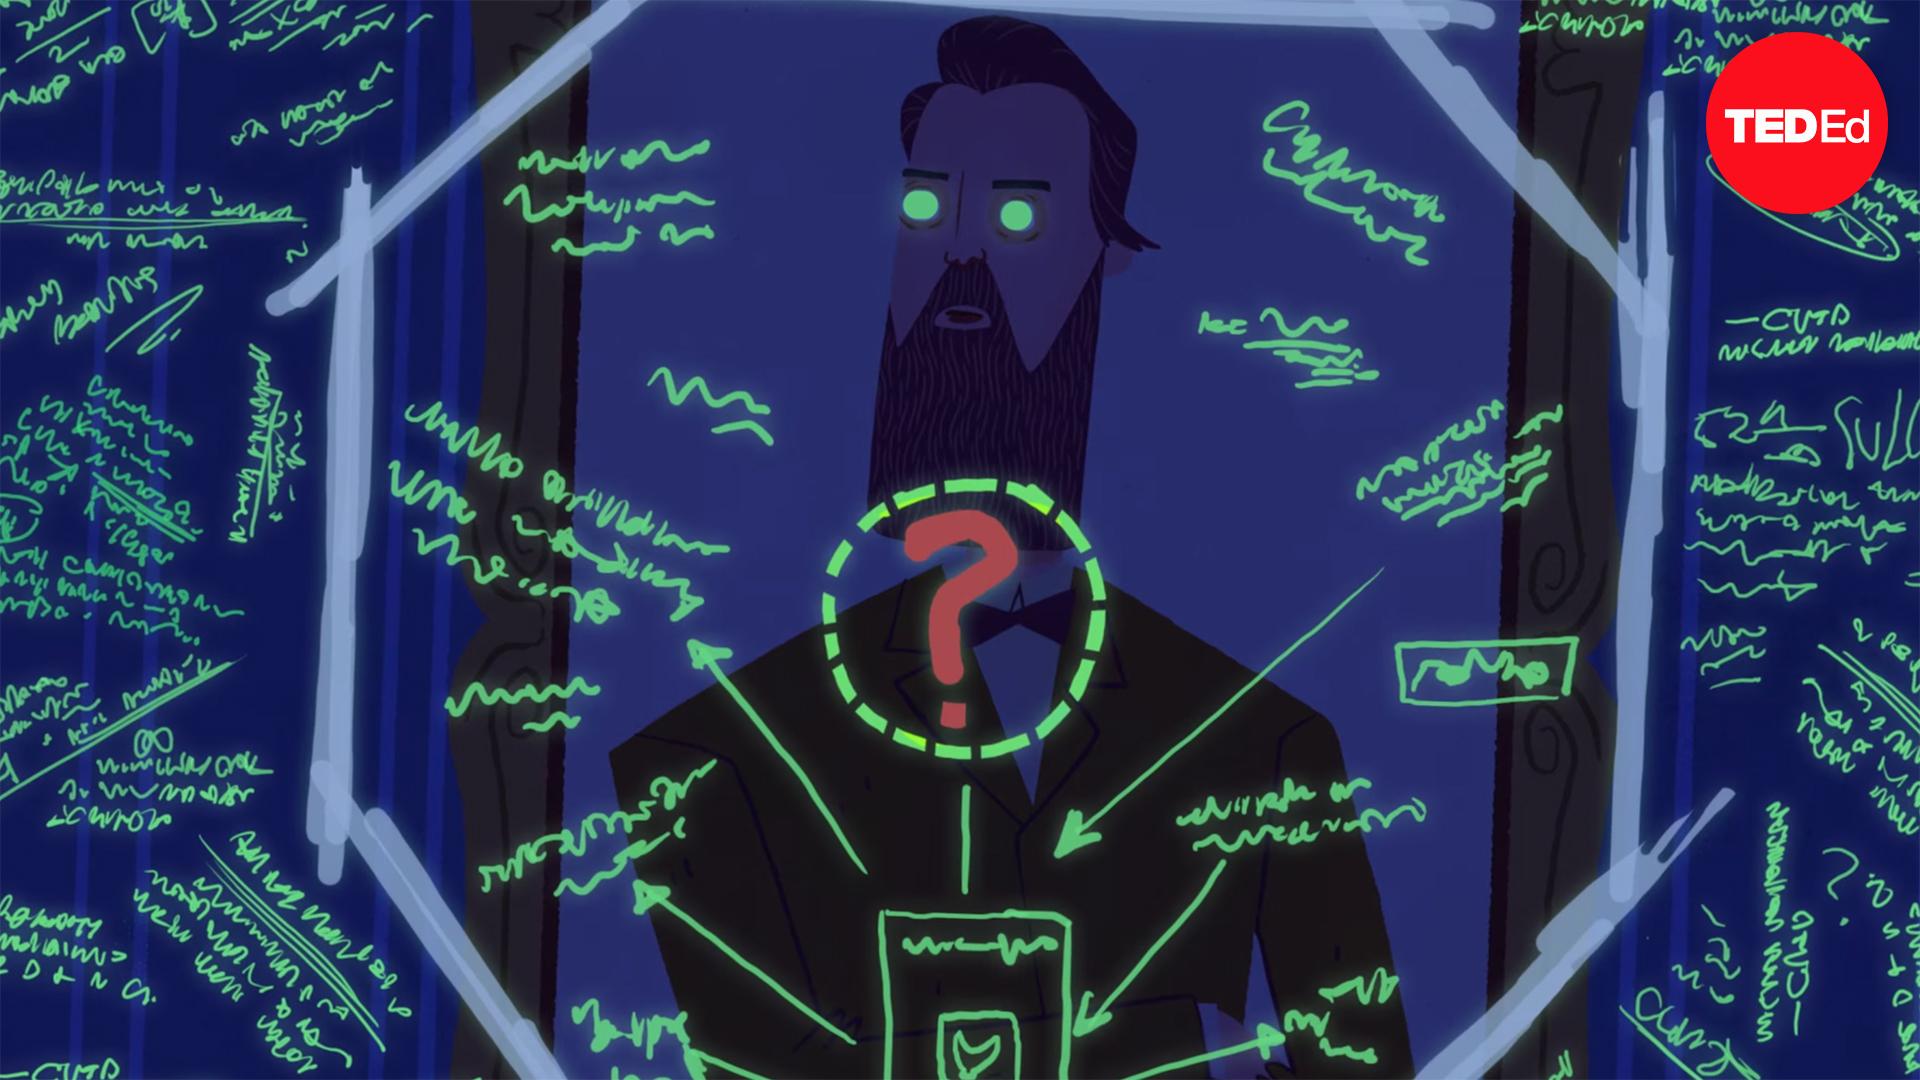 PatrickJMT: The origin of countless conspiracy theories